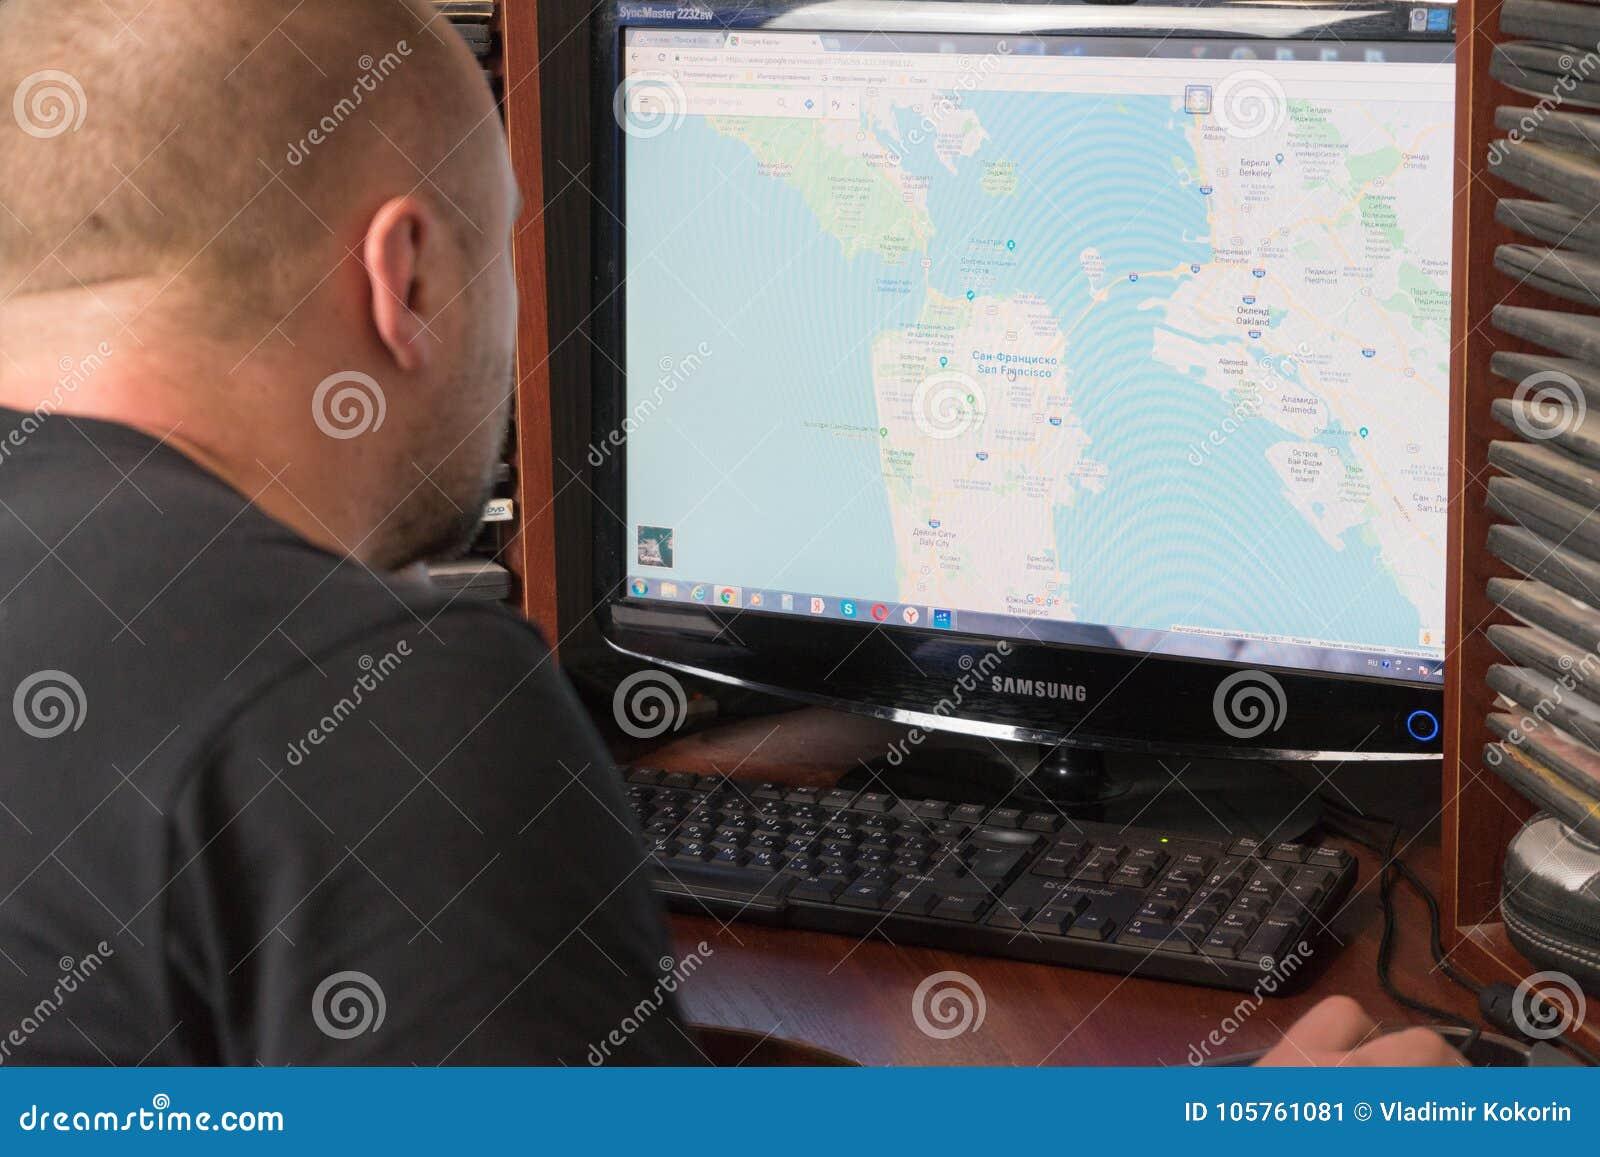 Belgorod, Russia - December 11, 2017: Man Uses Google Maps ... on download london tube map, topographic maps, online maps, download business maps, download icons, download bing maps,